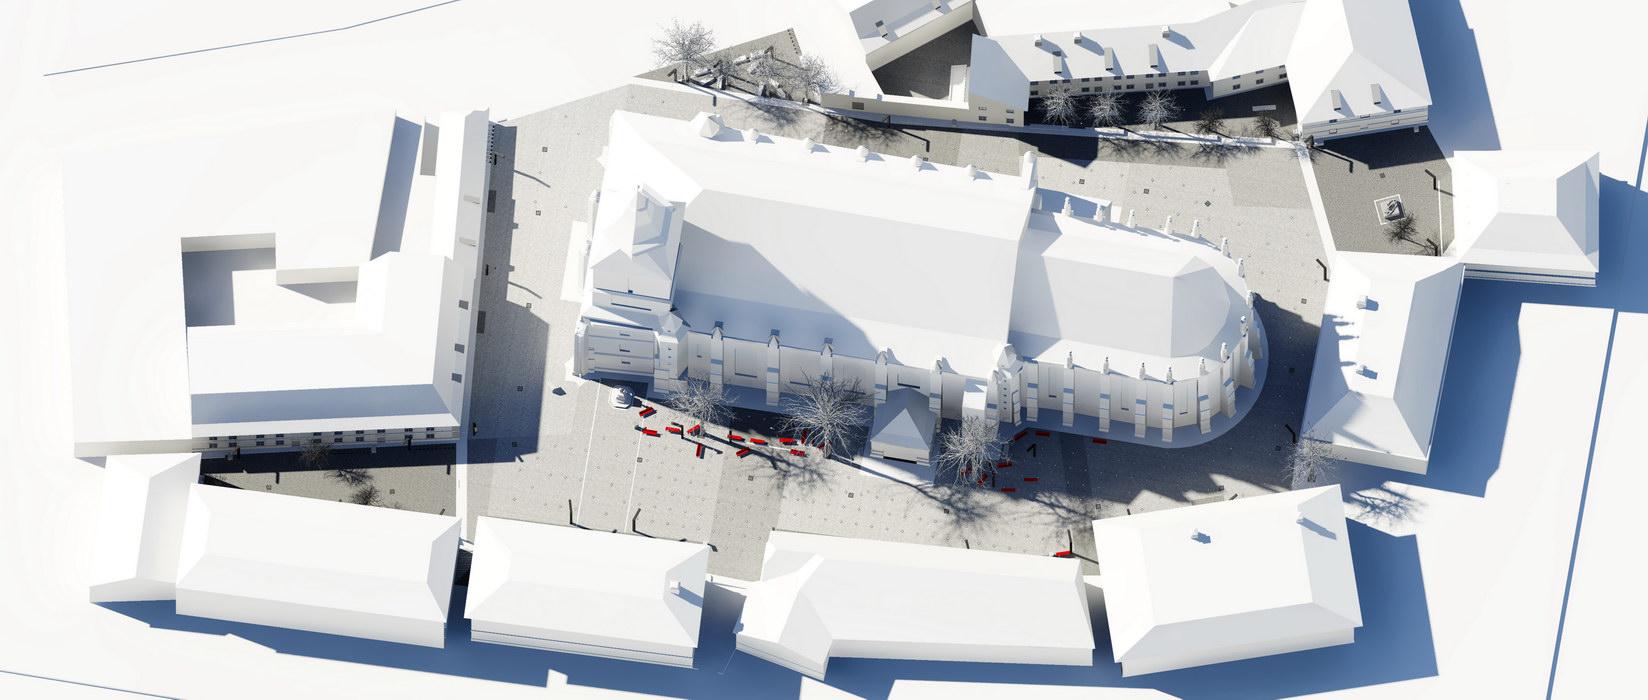 intro-crisan architecture-016_resize